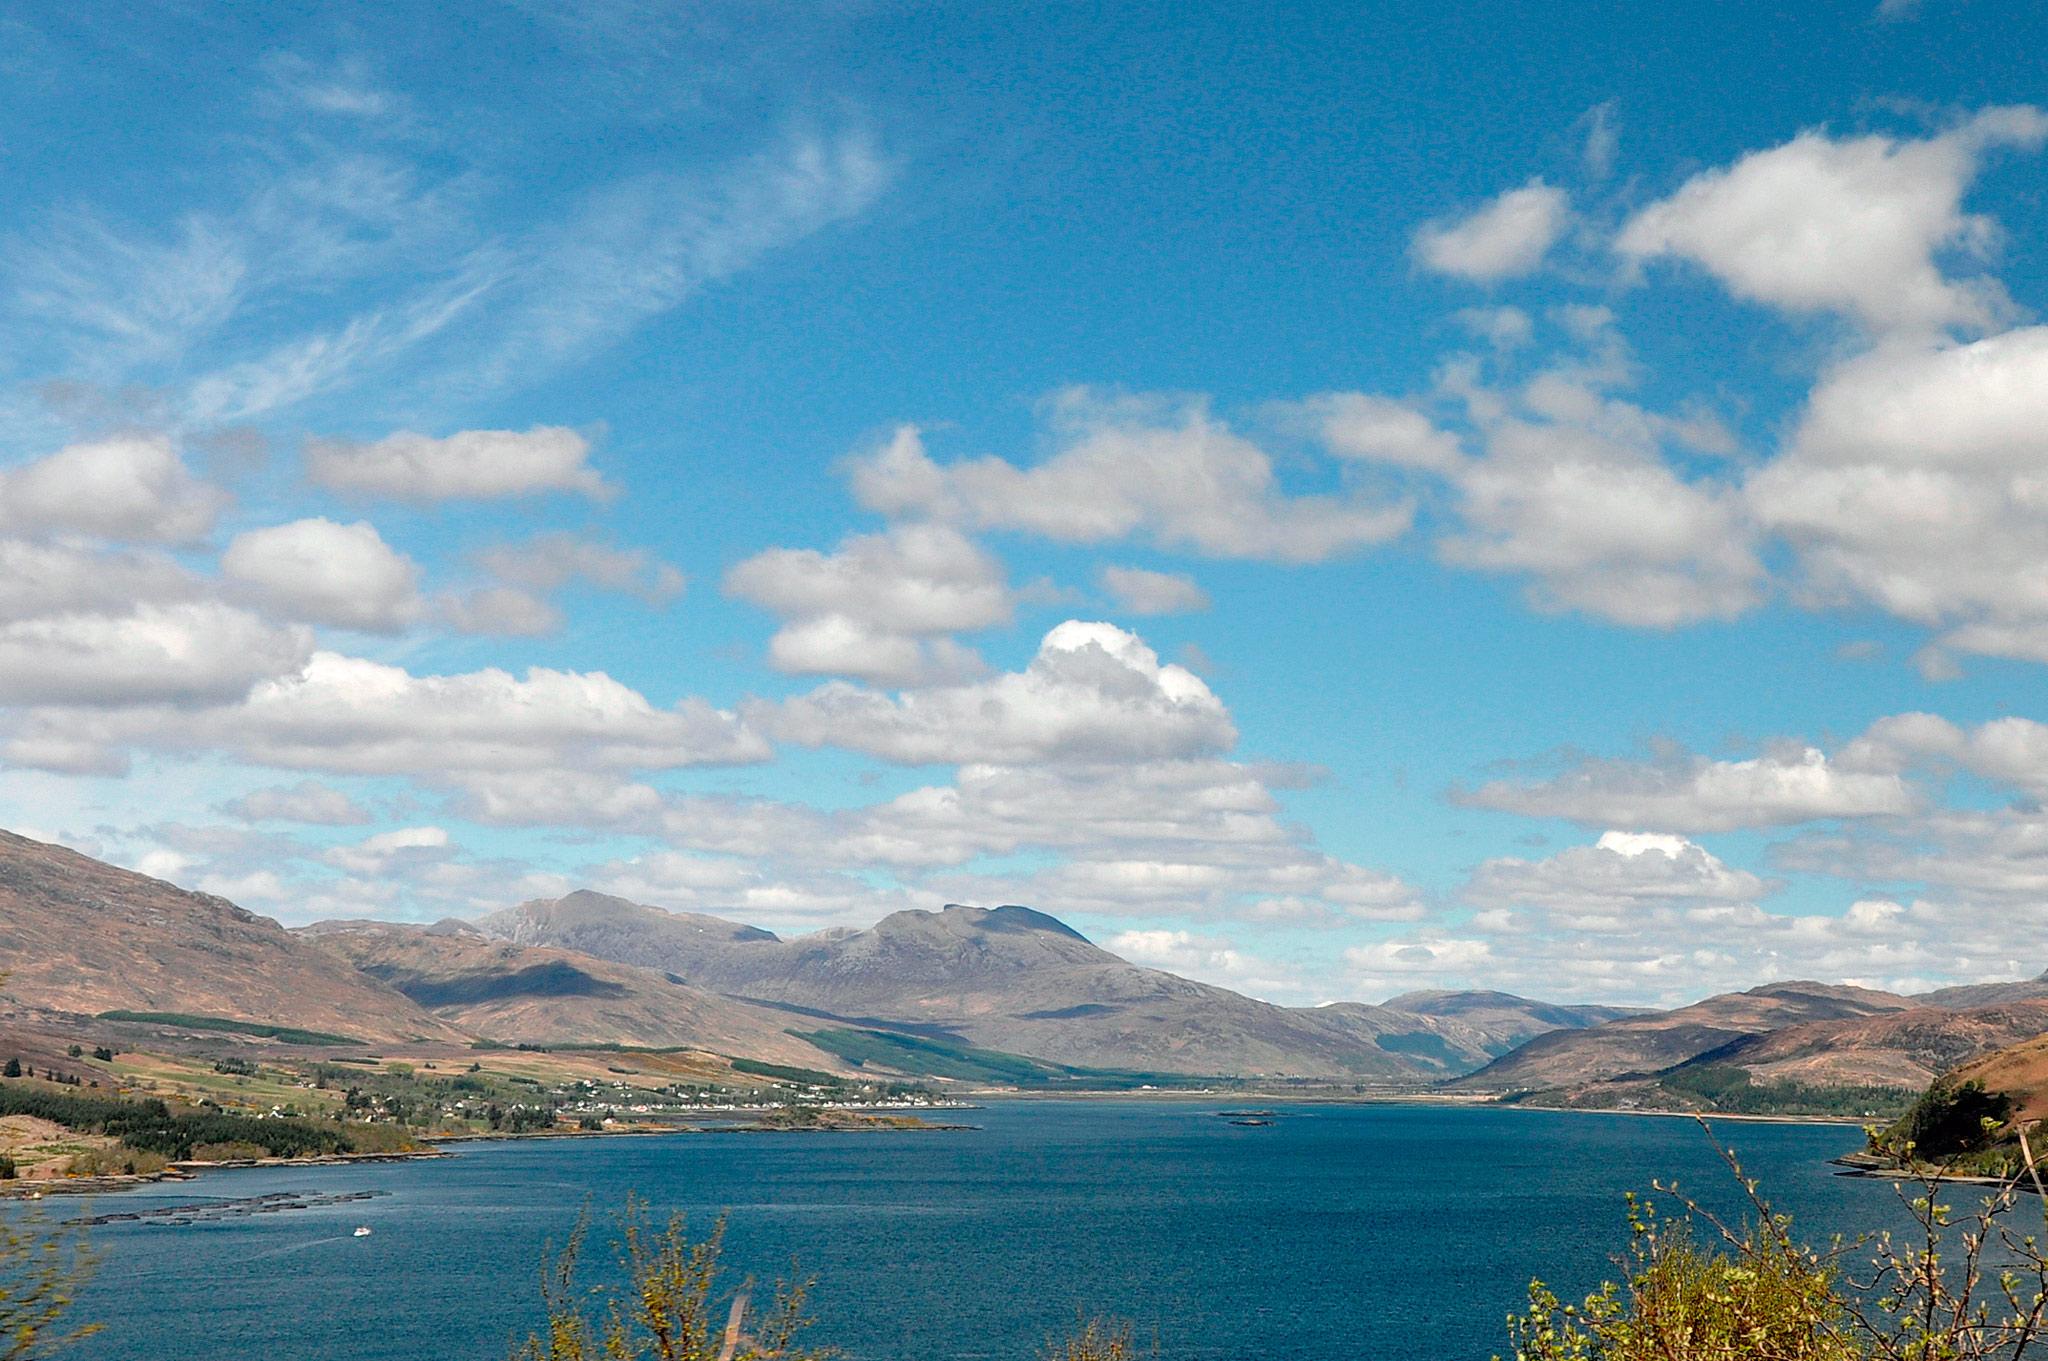 Écosse - les Highlands  Ecosse-loch-carrons-lo-loch-carron